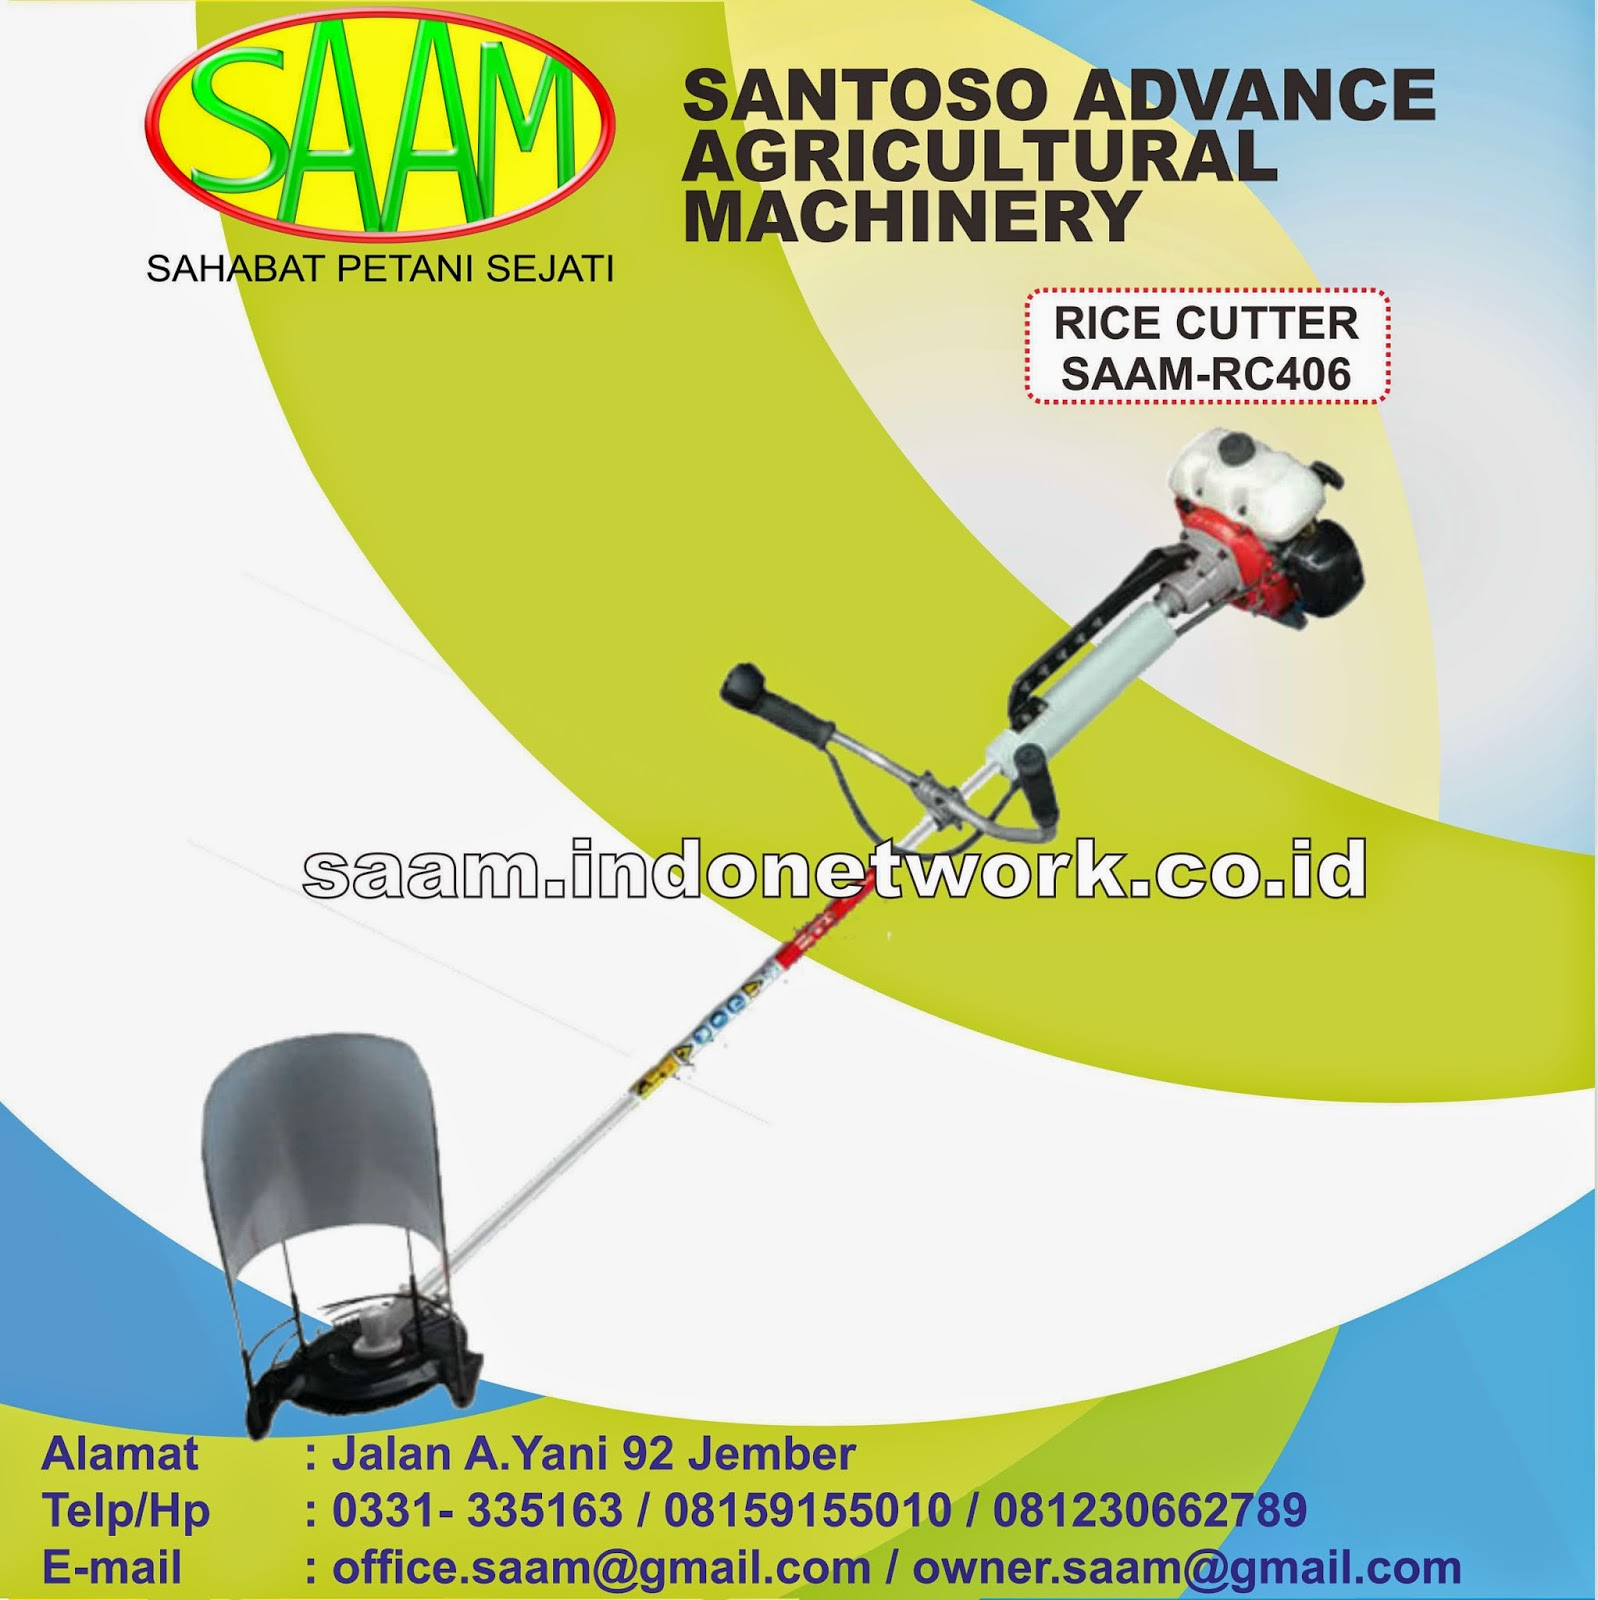 Pemotog Batang Padi Rice Cutter Saam Rc 406 Santoso Advance Paket Tudung 1 Pisau Dan Gearcase Agricultural Machinery